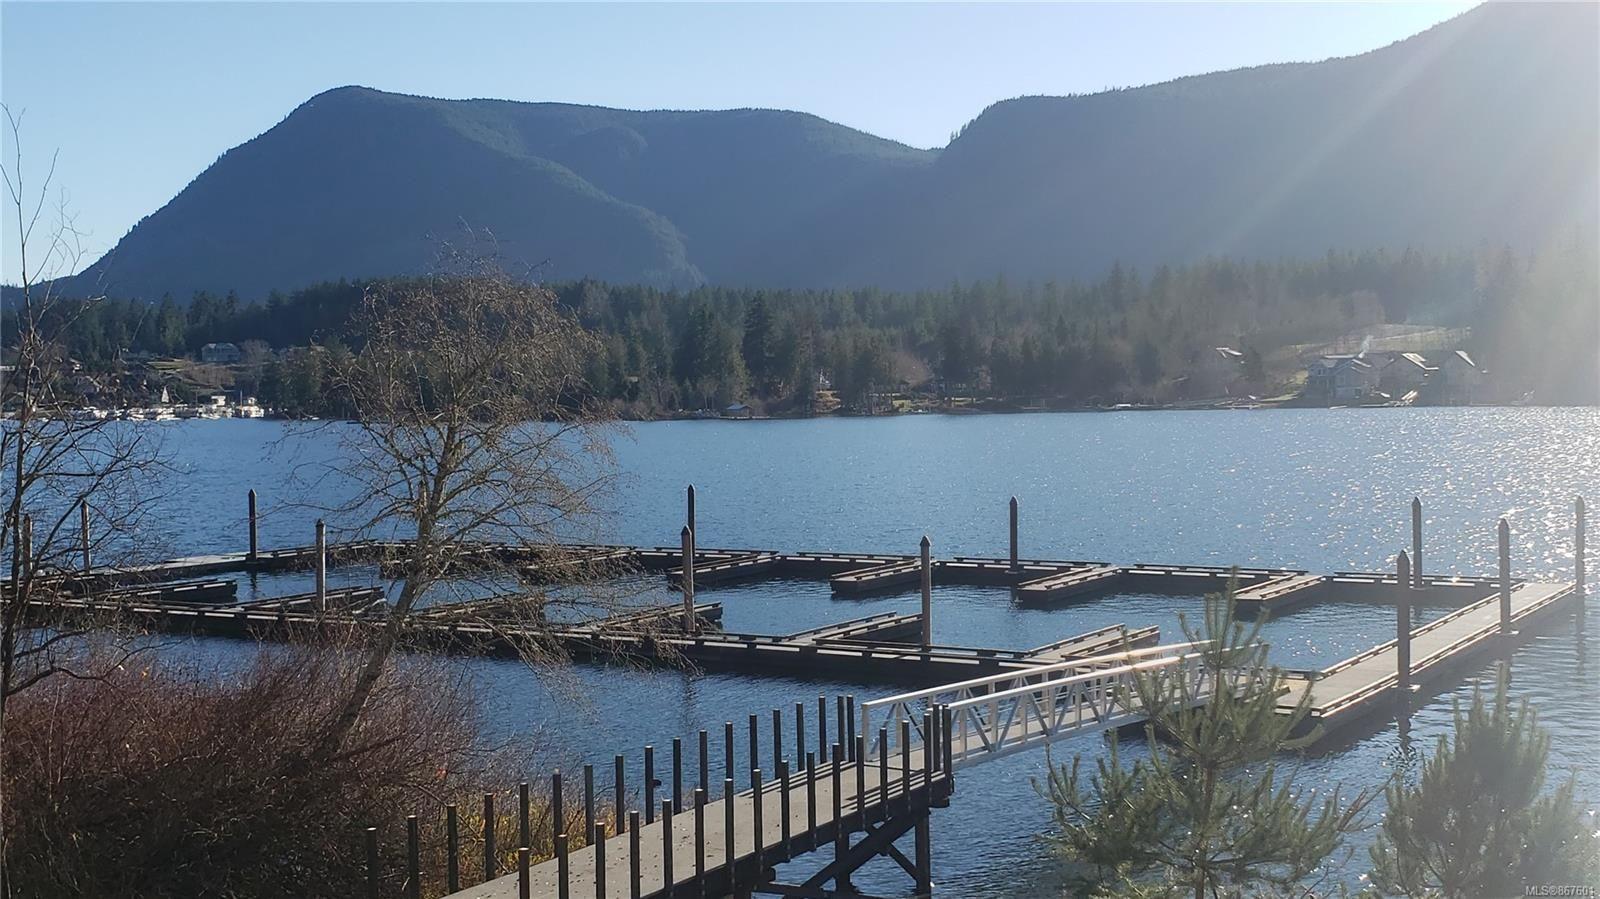 Main Photo: 7027 Sha-elum Dr in : Du Lake Cowichan Land for sale (Duncan)  : MLS®# 867601